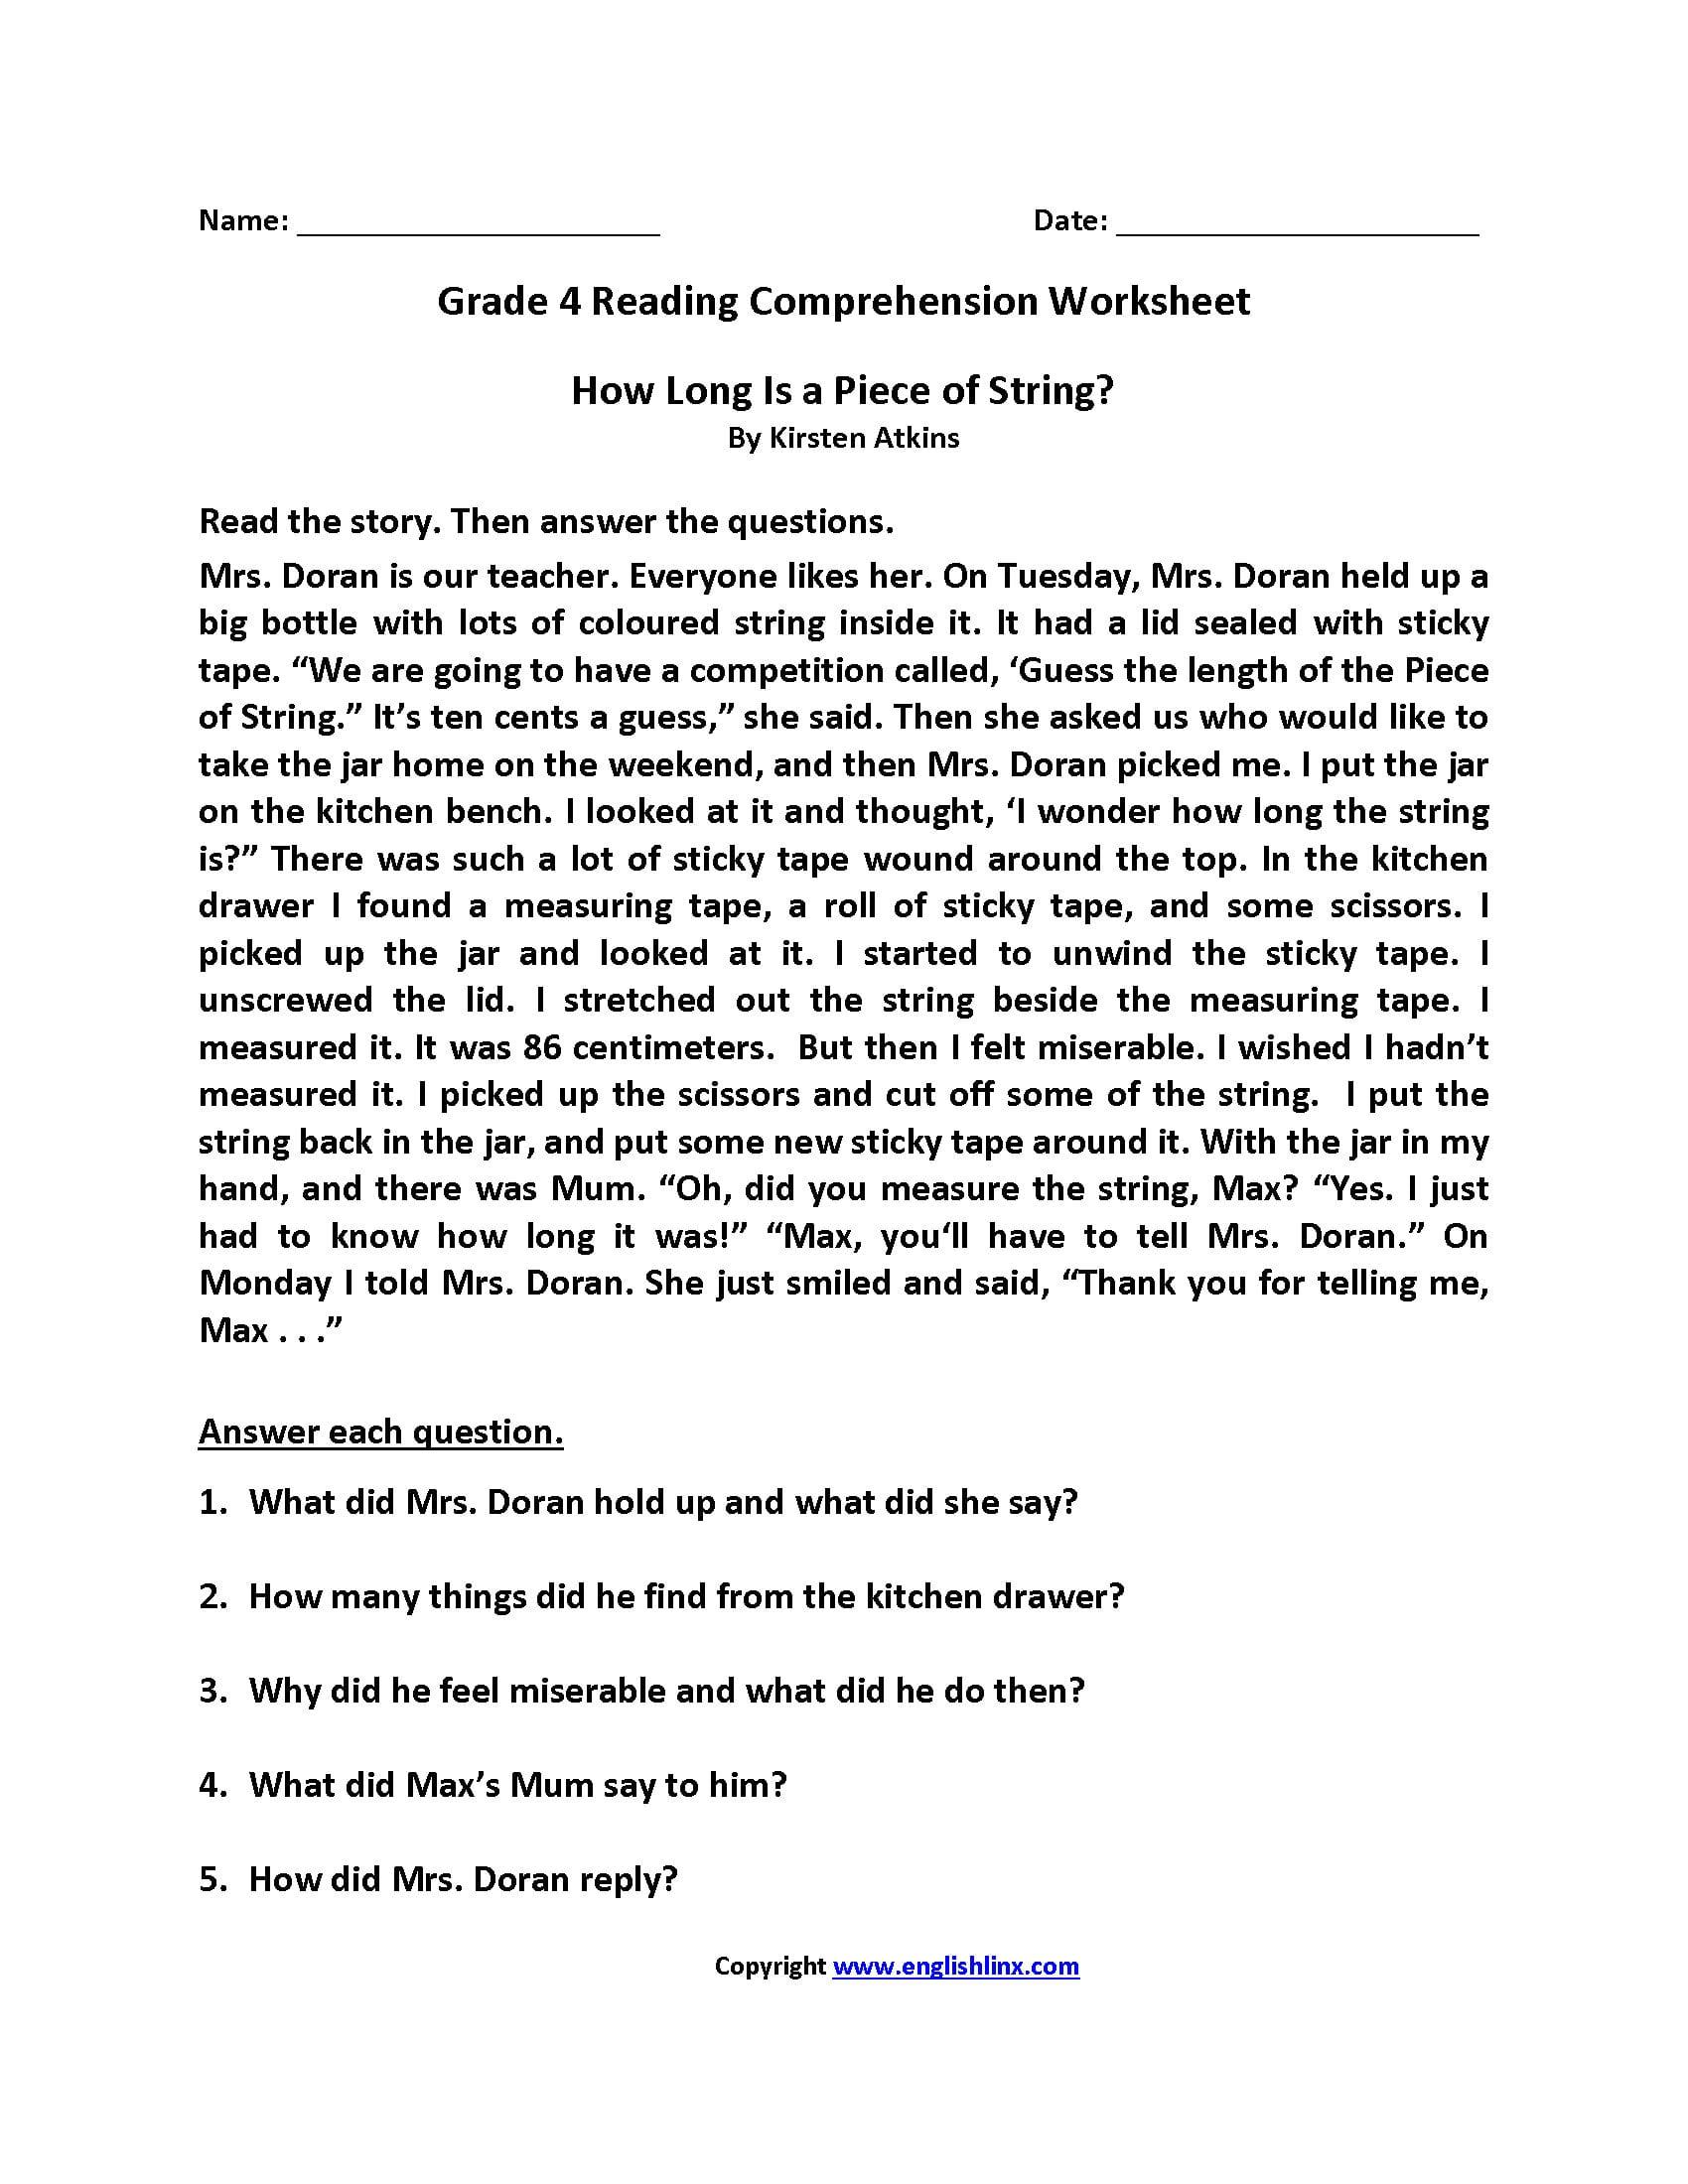 Reading Comprehension Worksheets 4th Grade